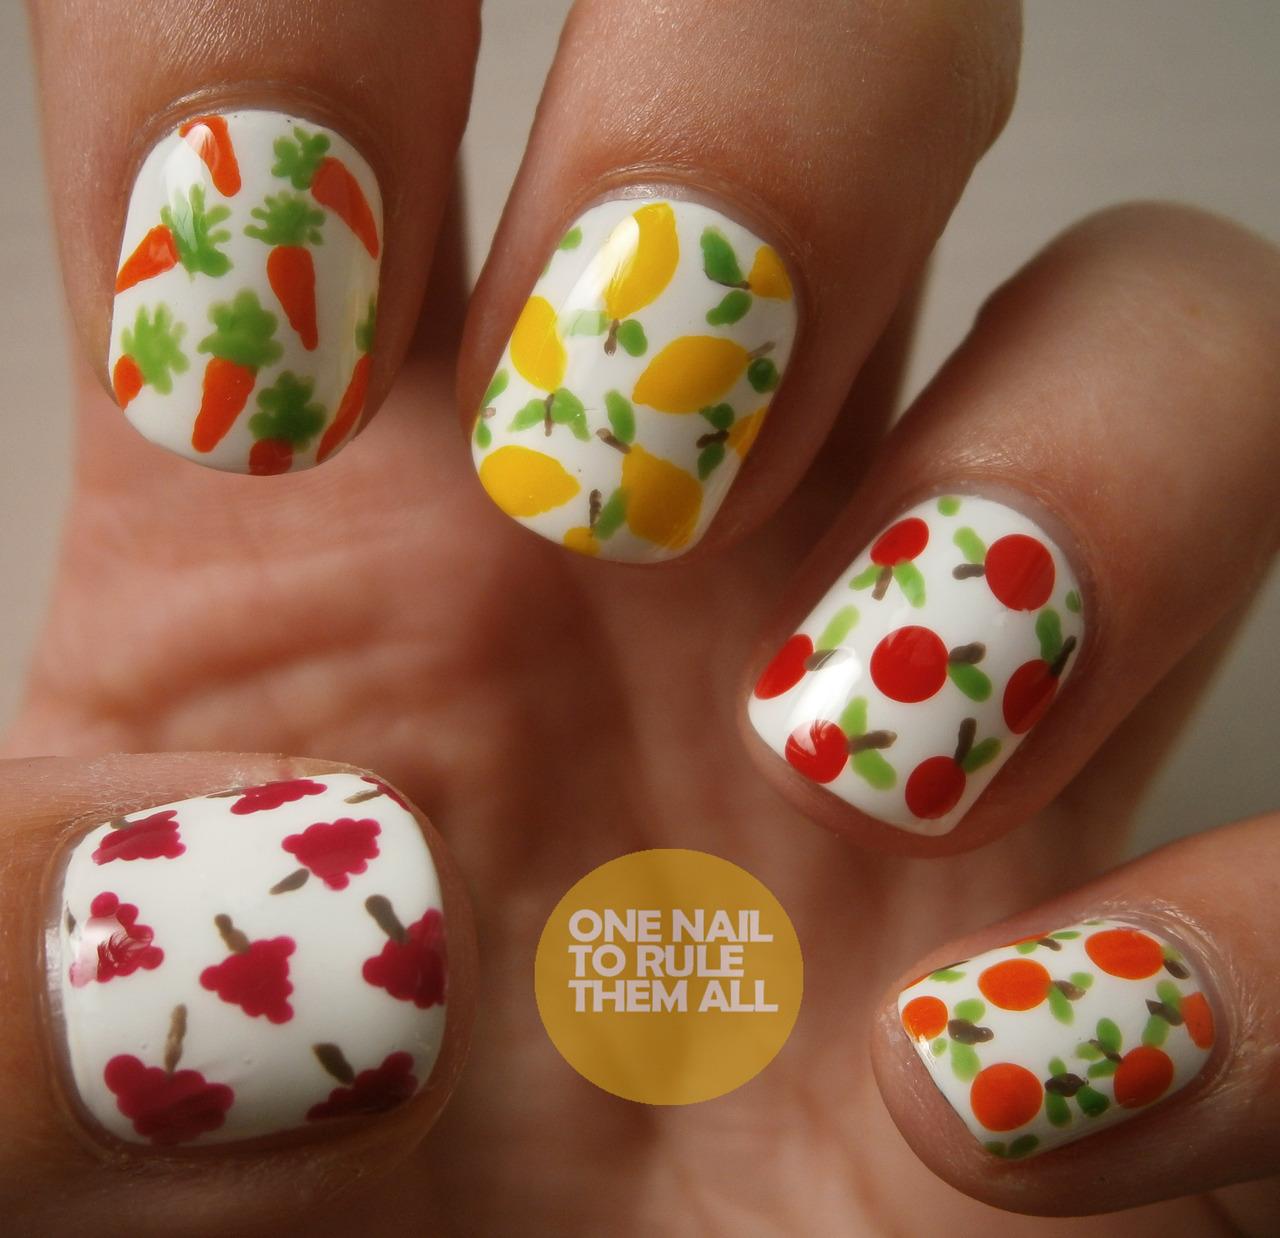 Pin Cute Girls Summer Nail Art Design Ajilbabcom Portal on